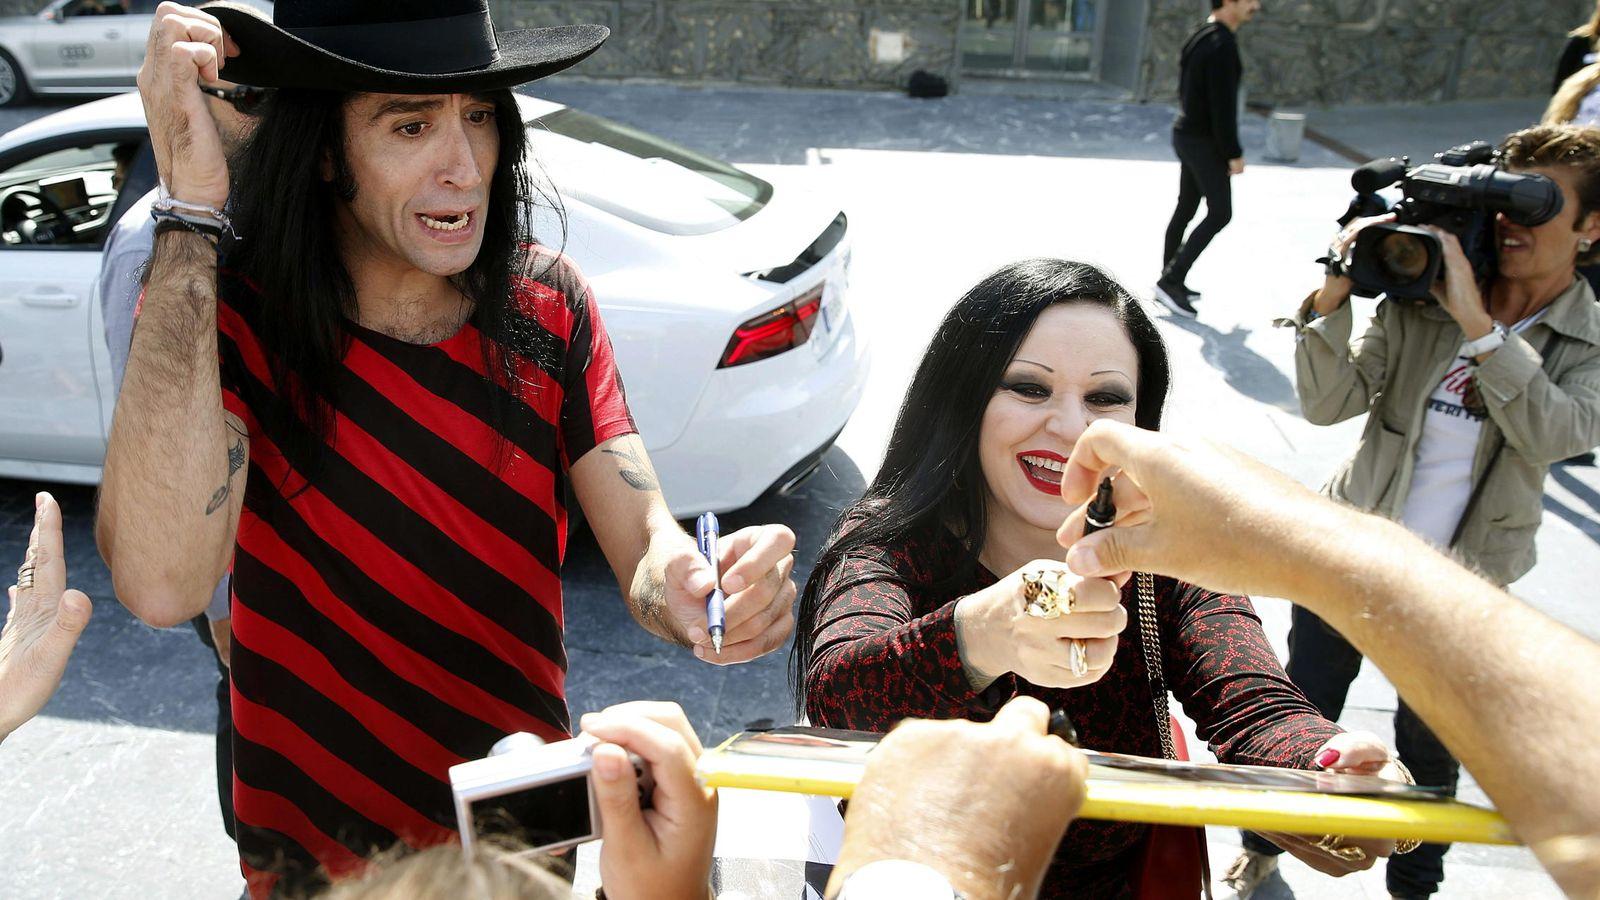 Foto: Vaquerizo y Alaska firmando autógrafos (EFE)